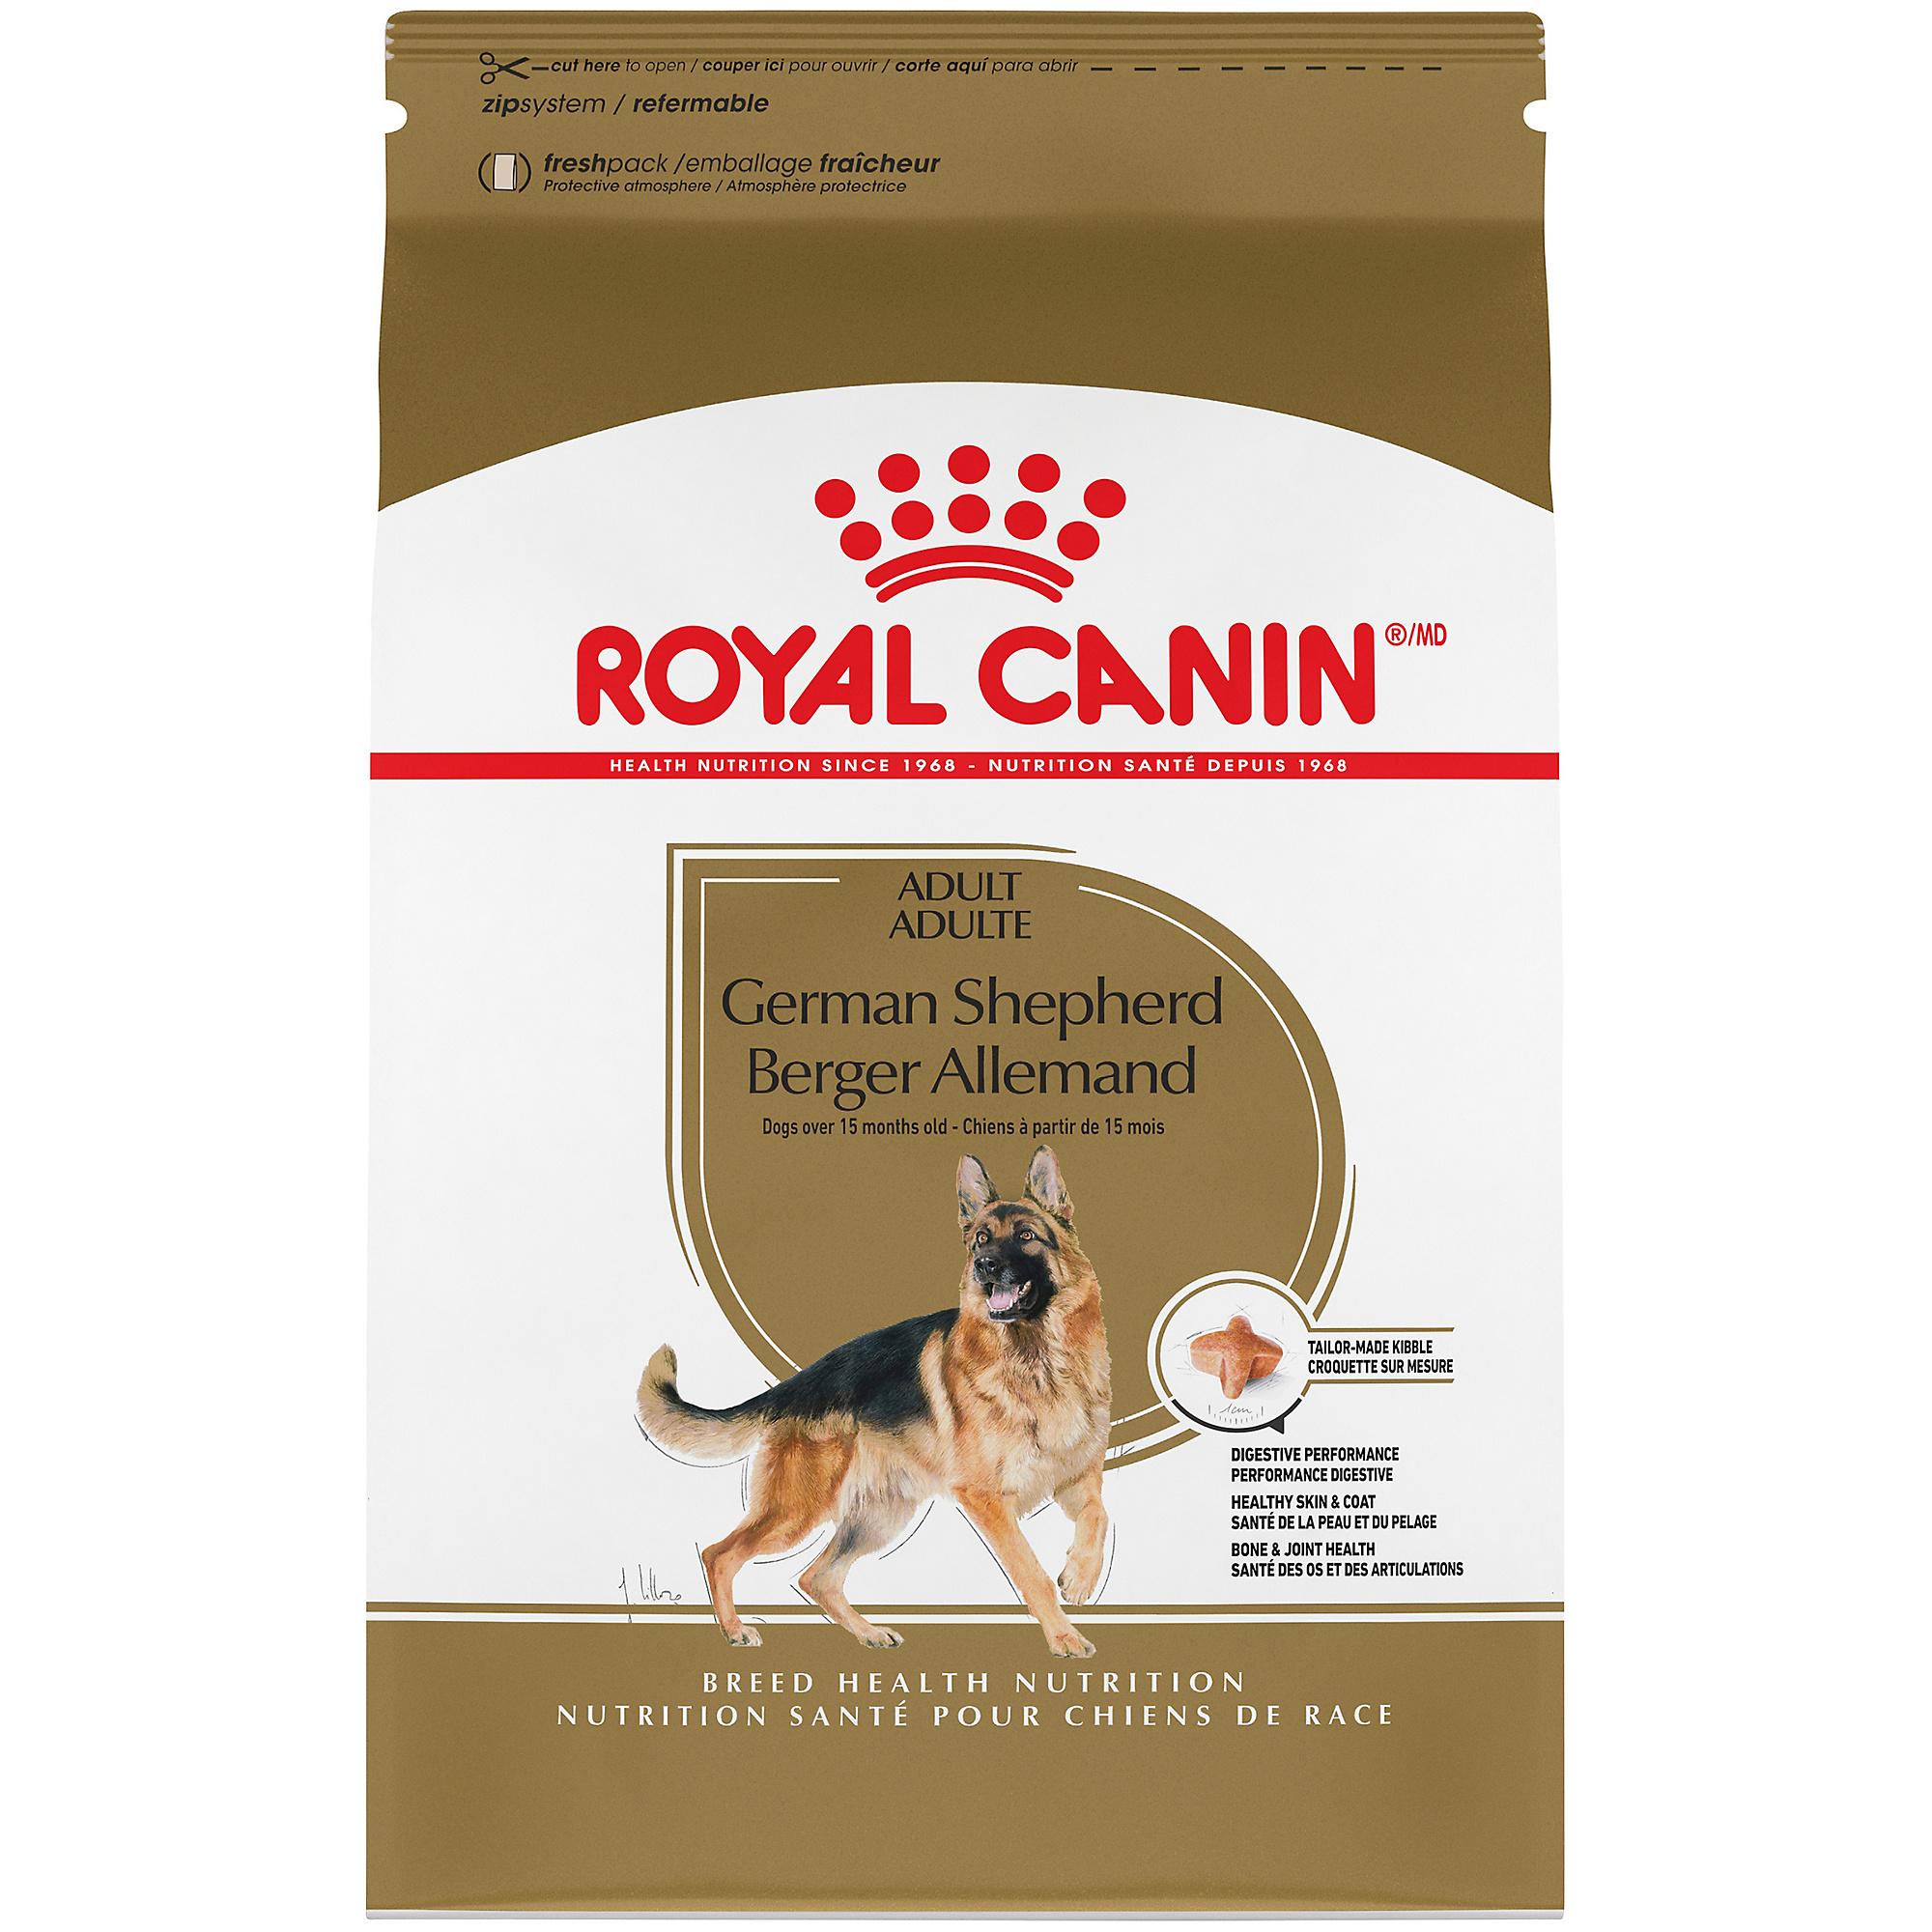 Royal Canin Breed Health Nutrition German Shepherd Adult Dry Dog Food Image